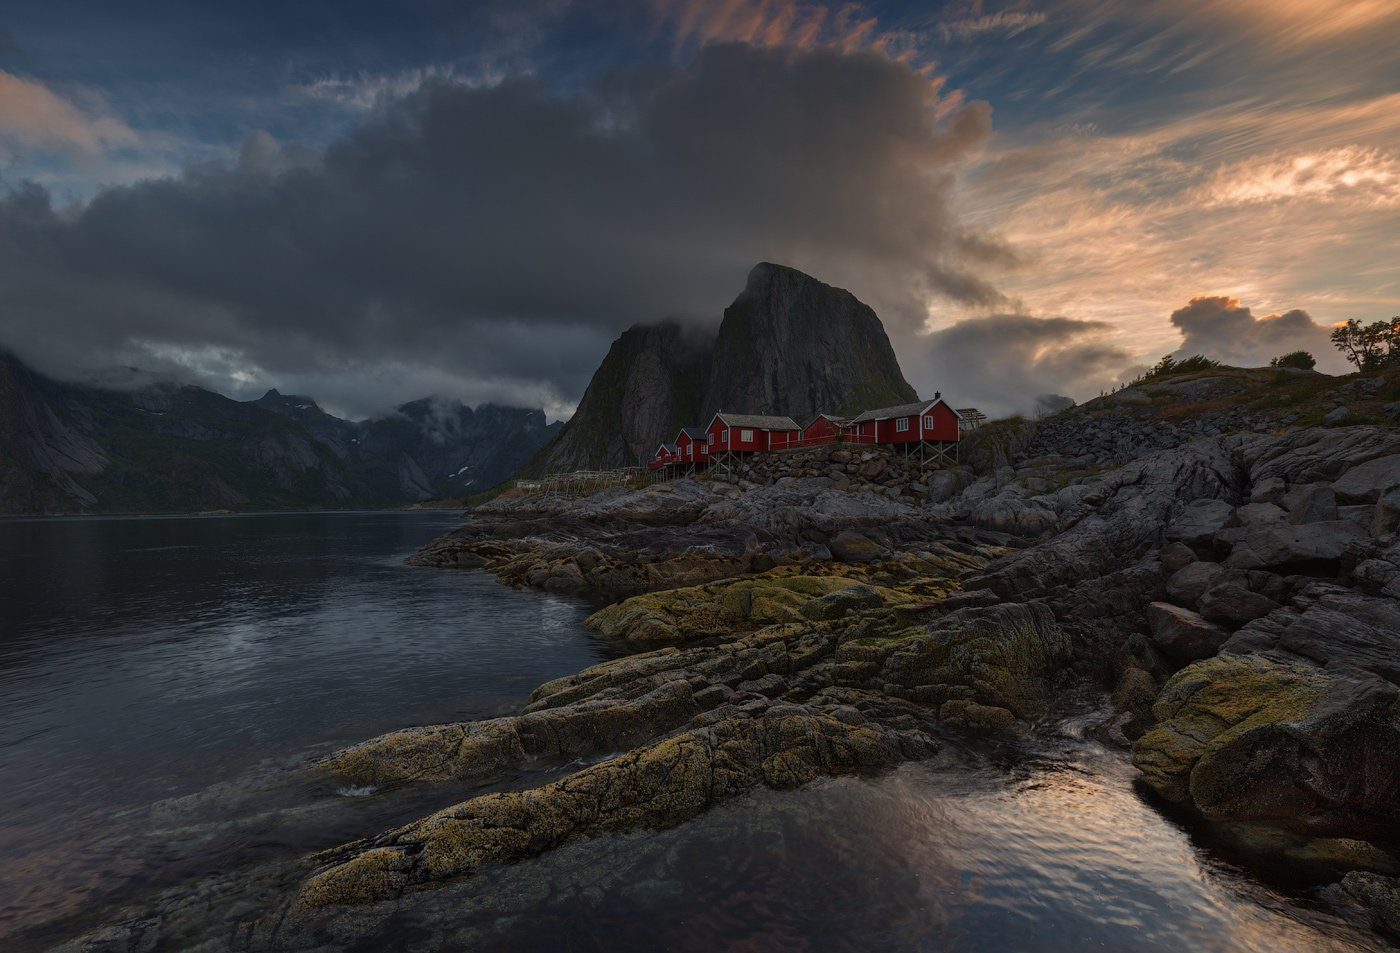 norway, норвегия, море, путешествие, lofoten, лофотены, Шевченко Юрий